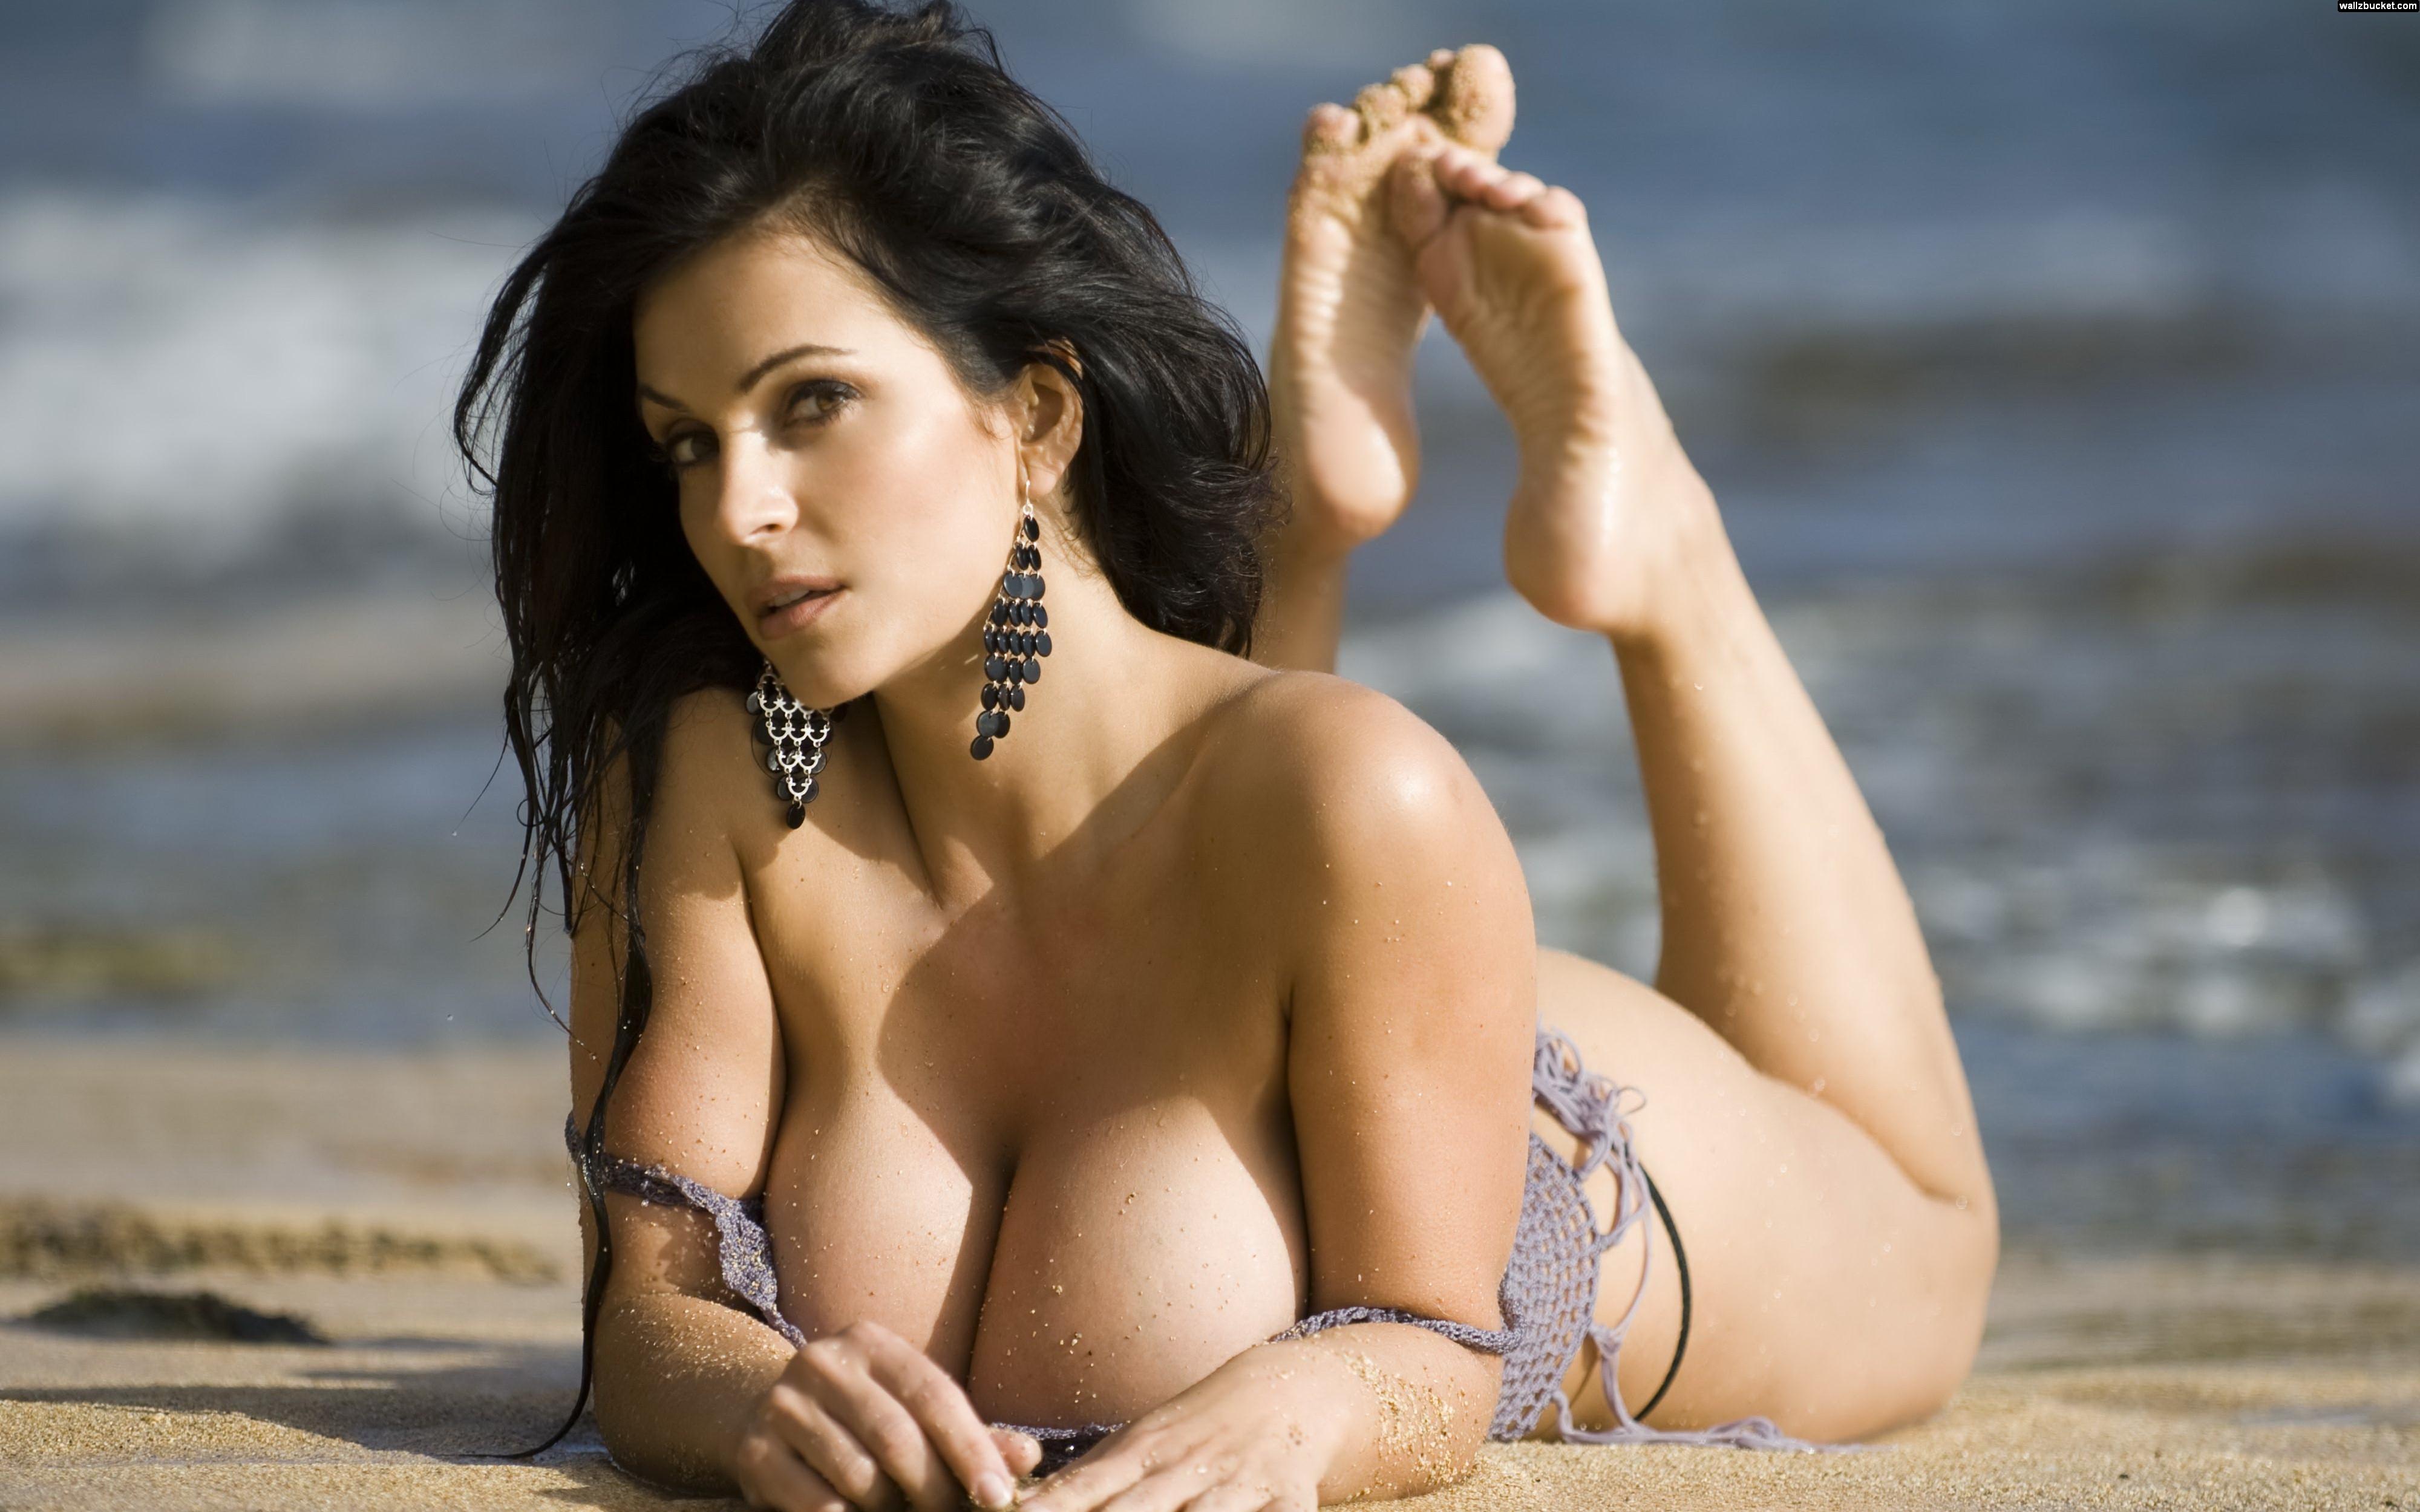 Pin On Hot Busty Girls